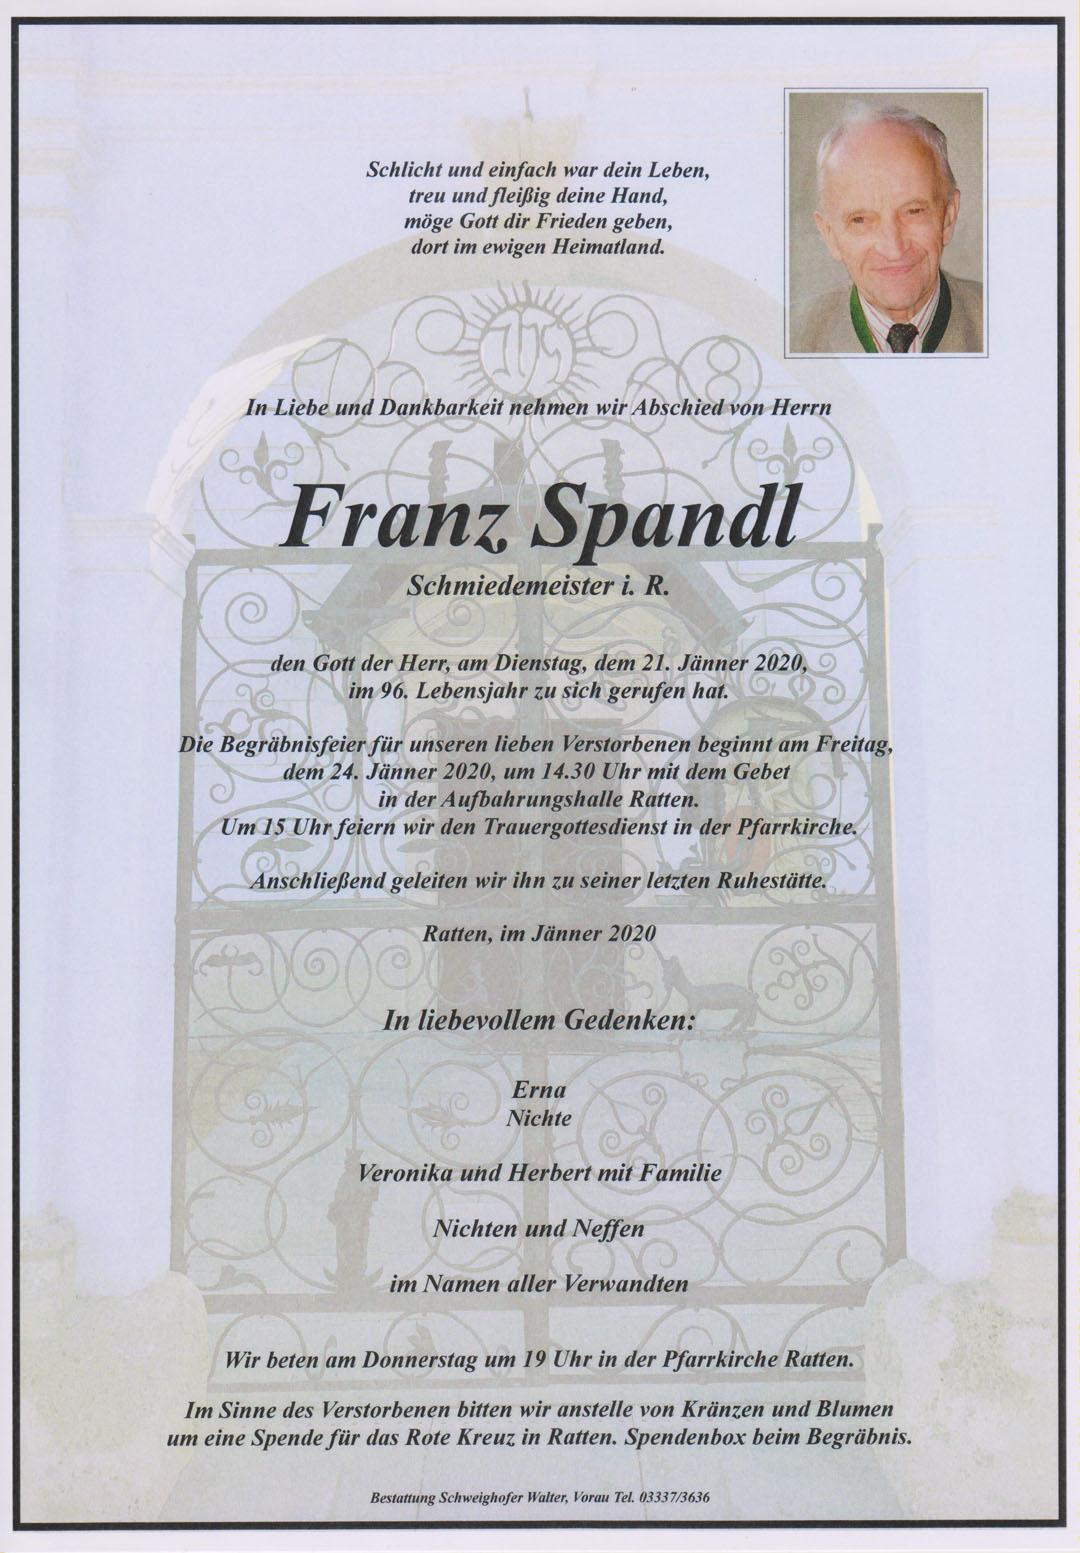 Franz Spandl